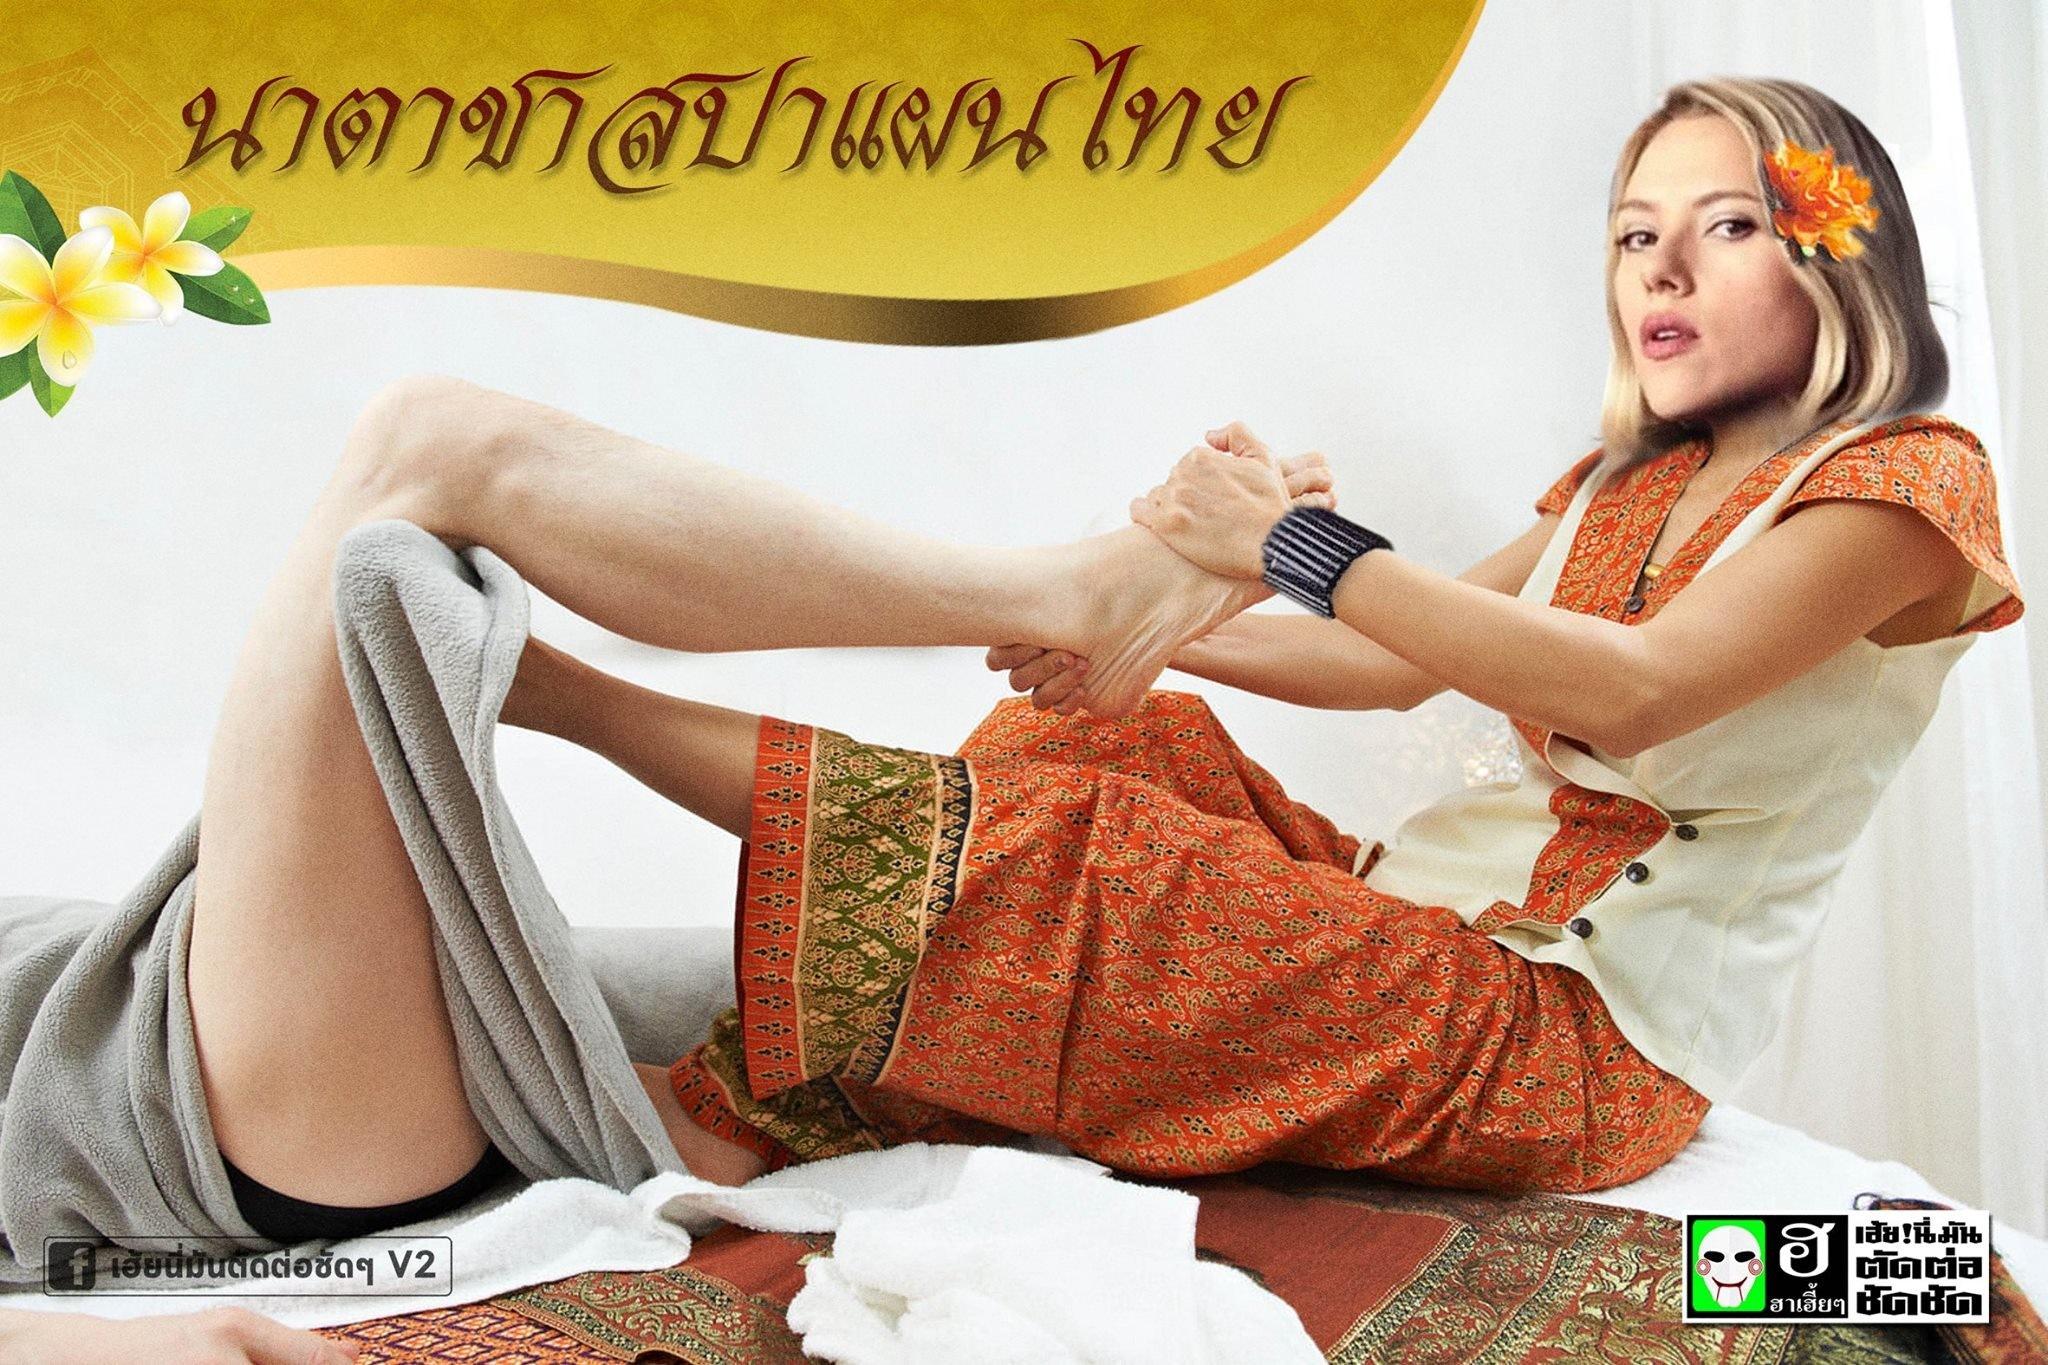 Thai massage, Massage, Jub Thaimassage Muri, Faasai Thai Massage Bray, DMoon Thai Massage, Bangkok, Beauty Parlour, Spa, Yoga, Therapy, traditional thai massage, Leg, Footwear, Leisure, Advertising, Sitting, Fashion accessory, Style